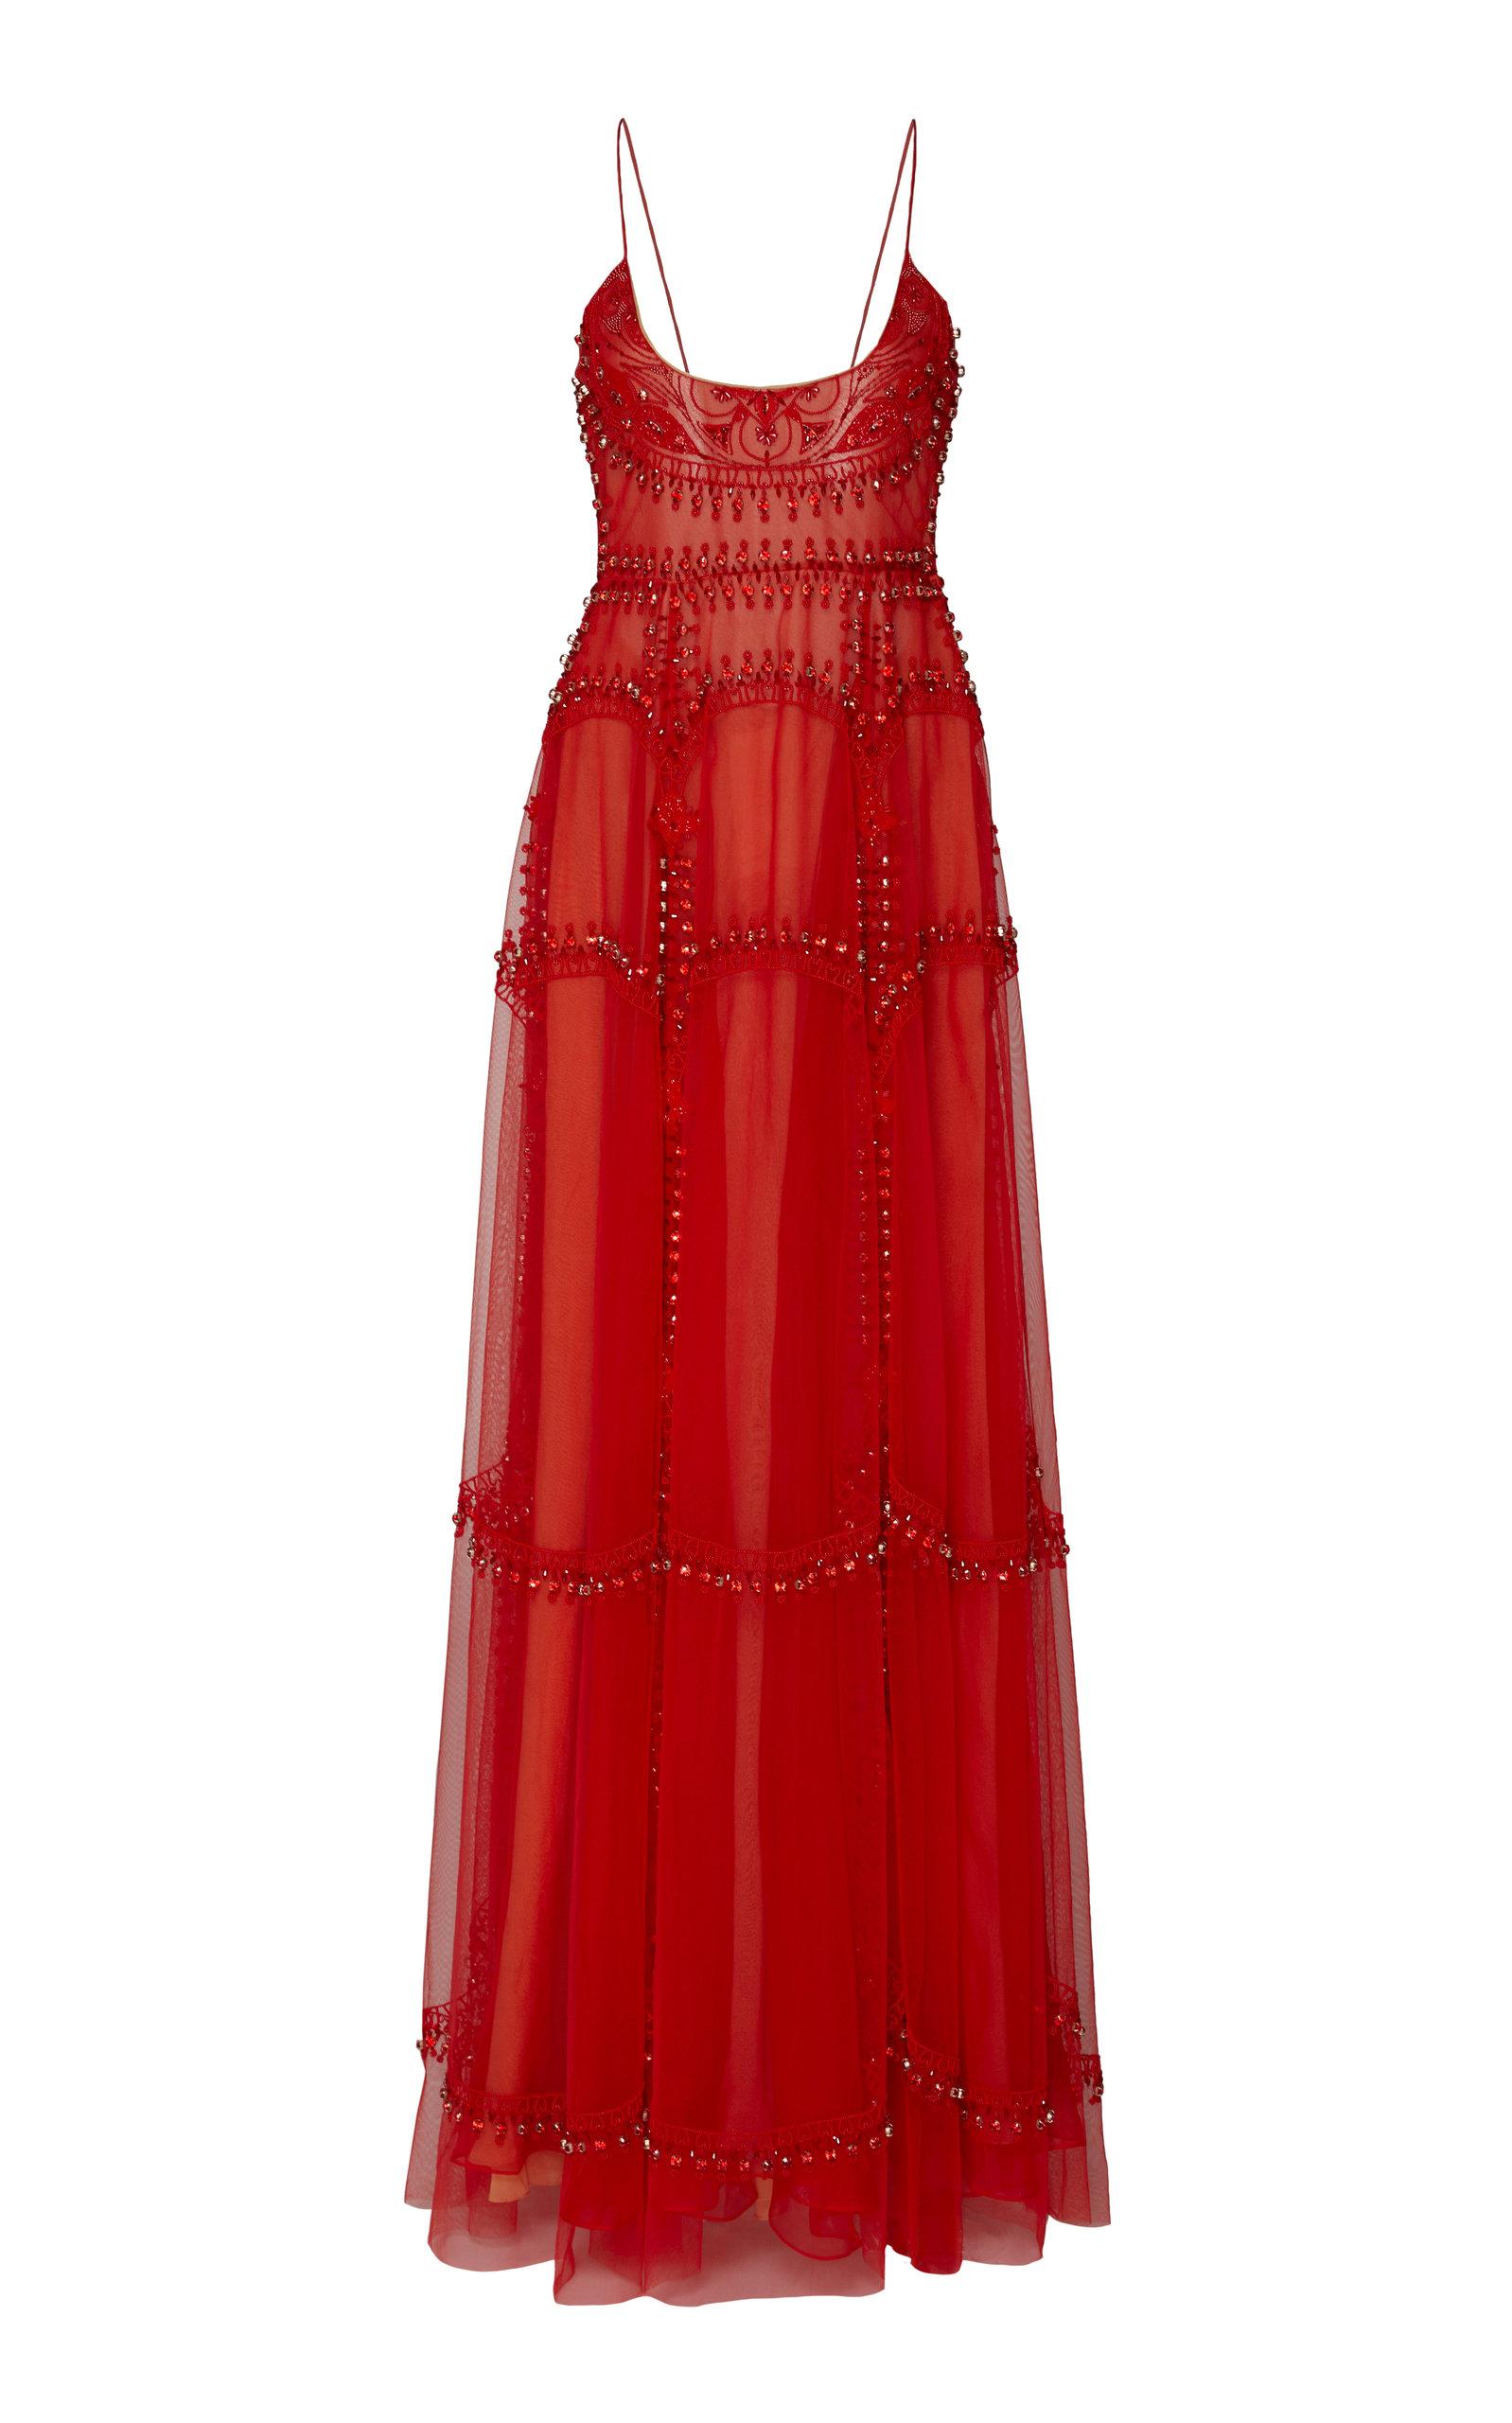 CUCCULELLI SHAHEEN Gateway Gown in Red